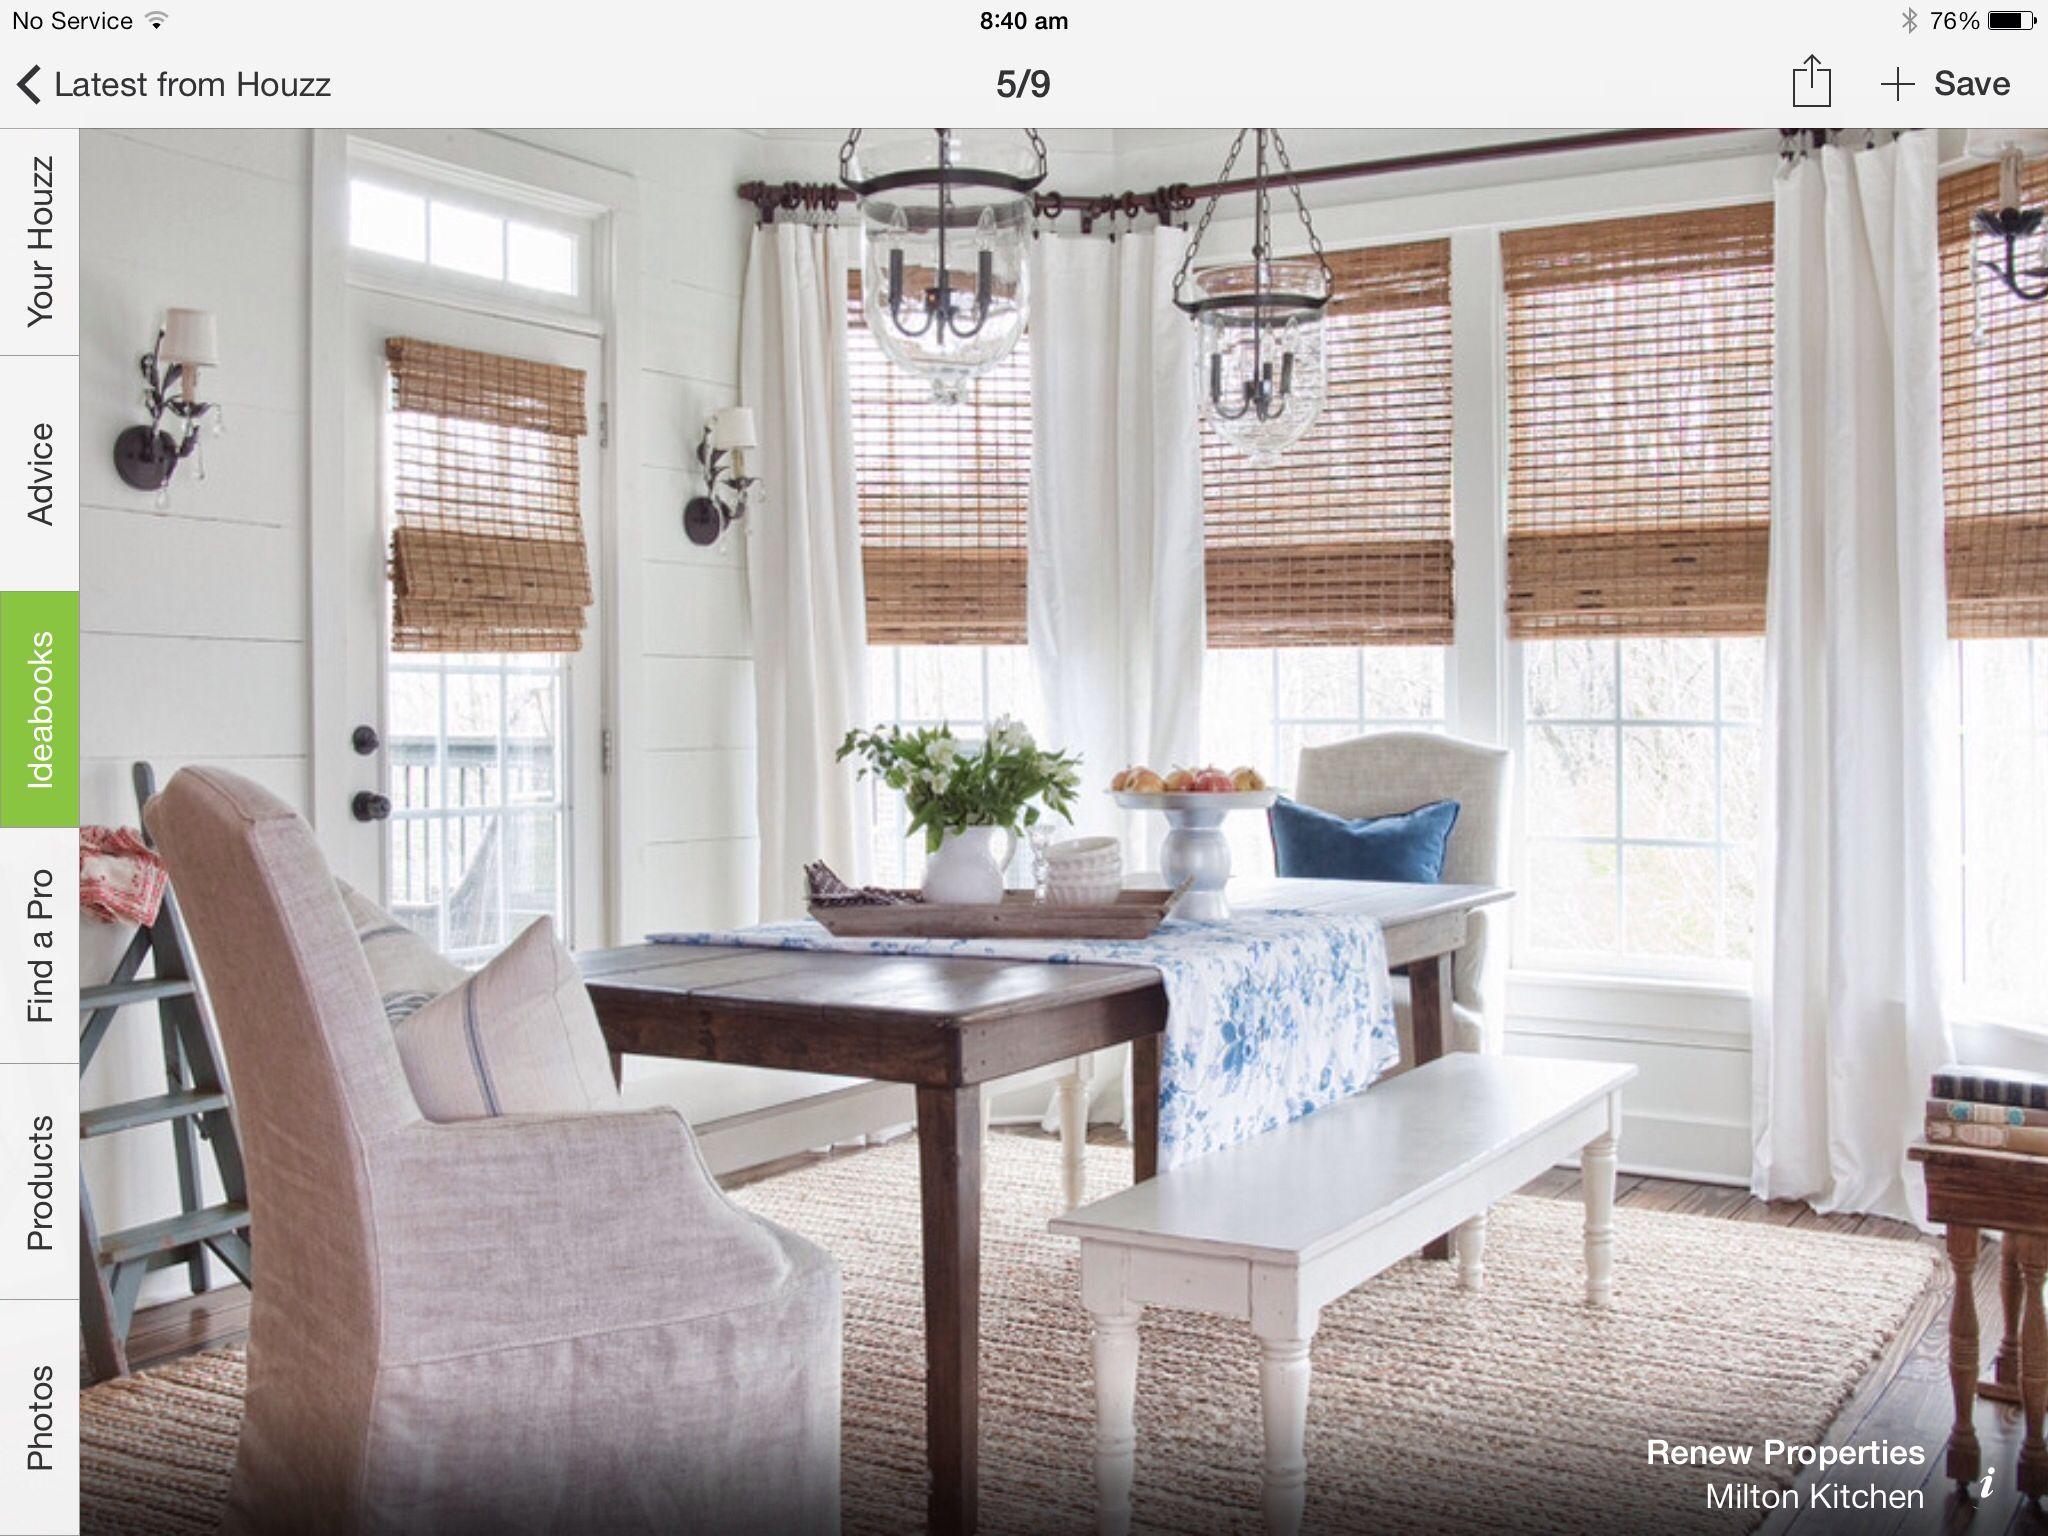 Window treatment ideas for a sunroom  nice windows  cortinas  pinterest  window sunroom and curtain ideas